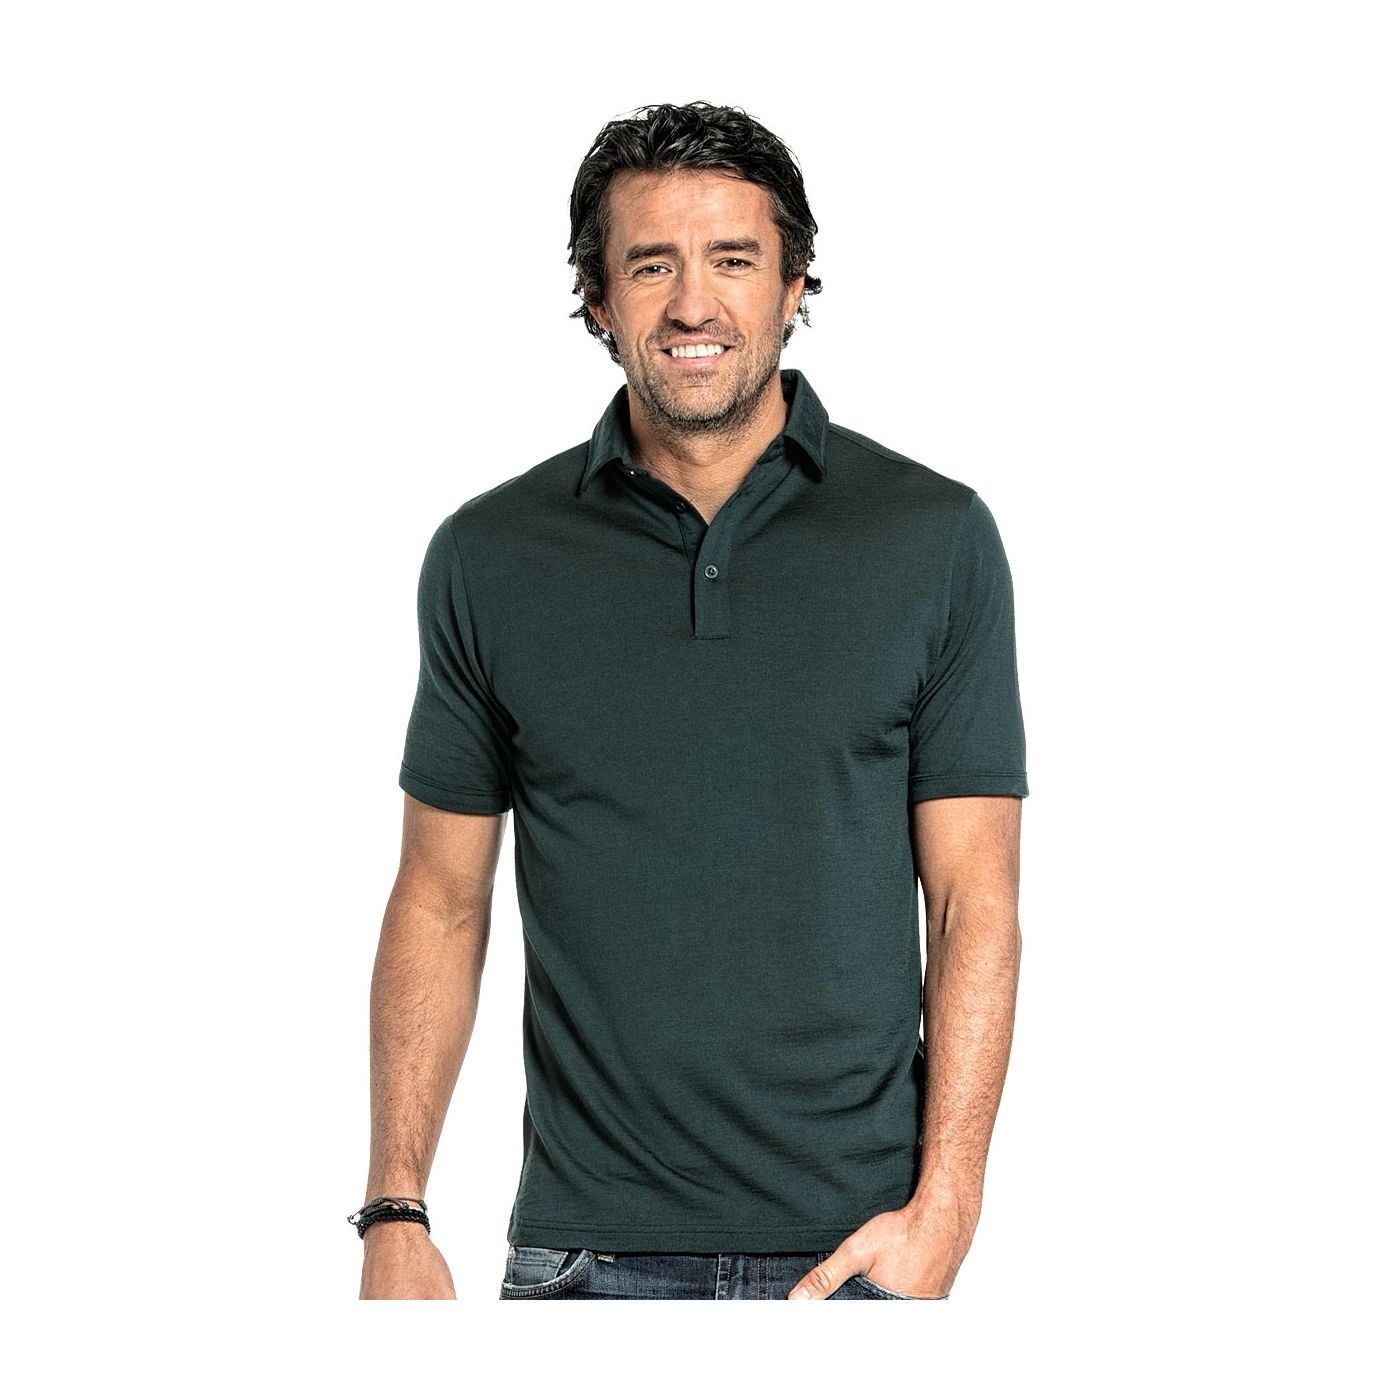 Polo shirt for men made of Merino wool in Dark green